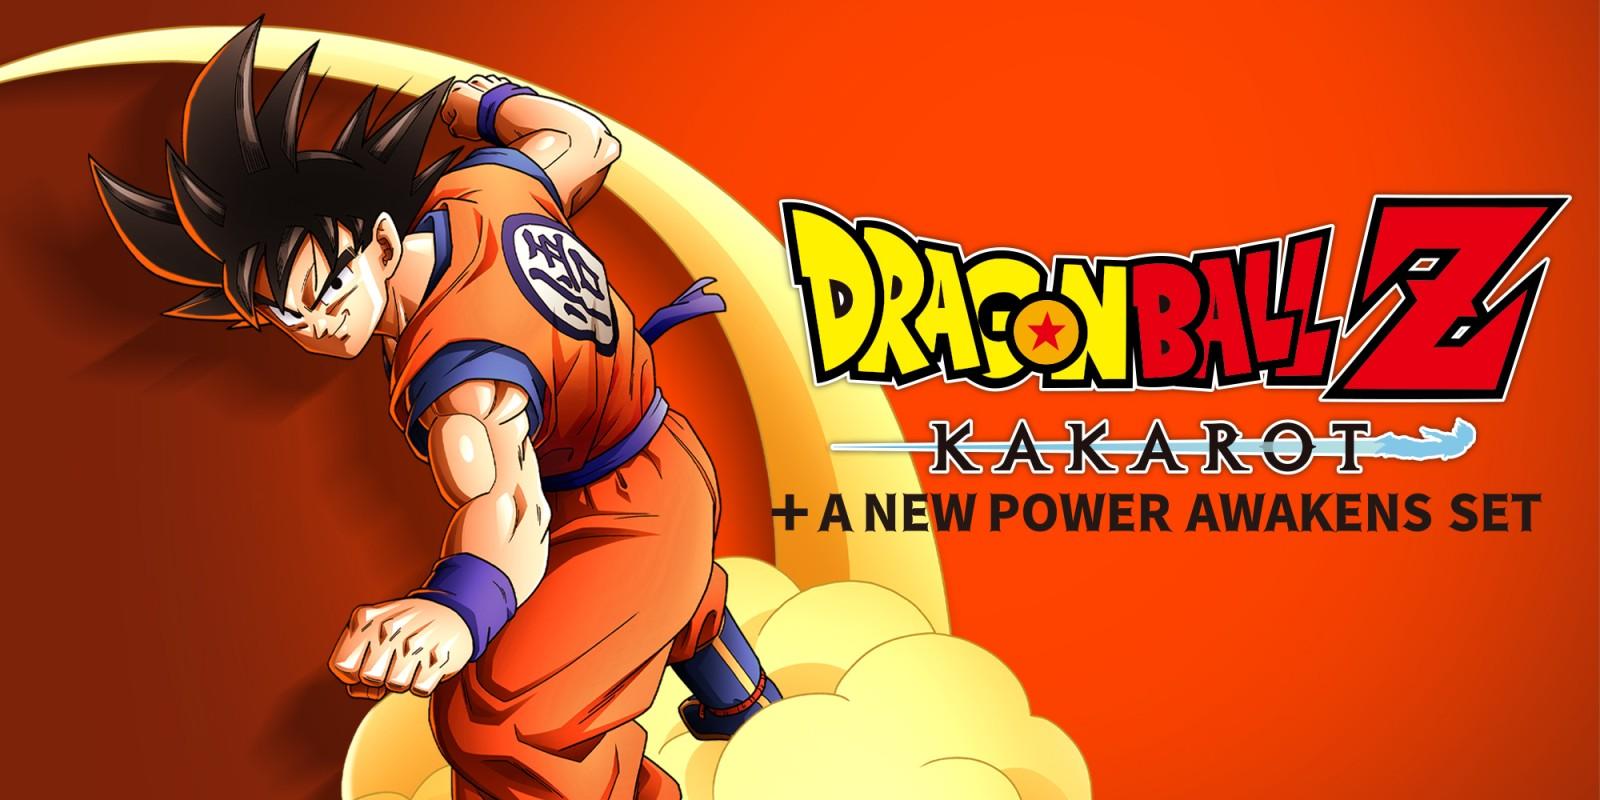 Nuovo video di DRAGON BALL Z: KAKAROT + A NEW POWER AWAKENS SET